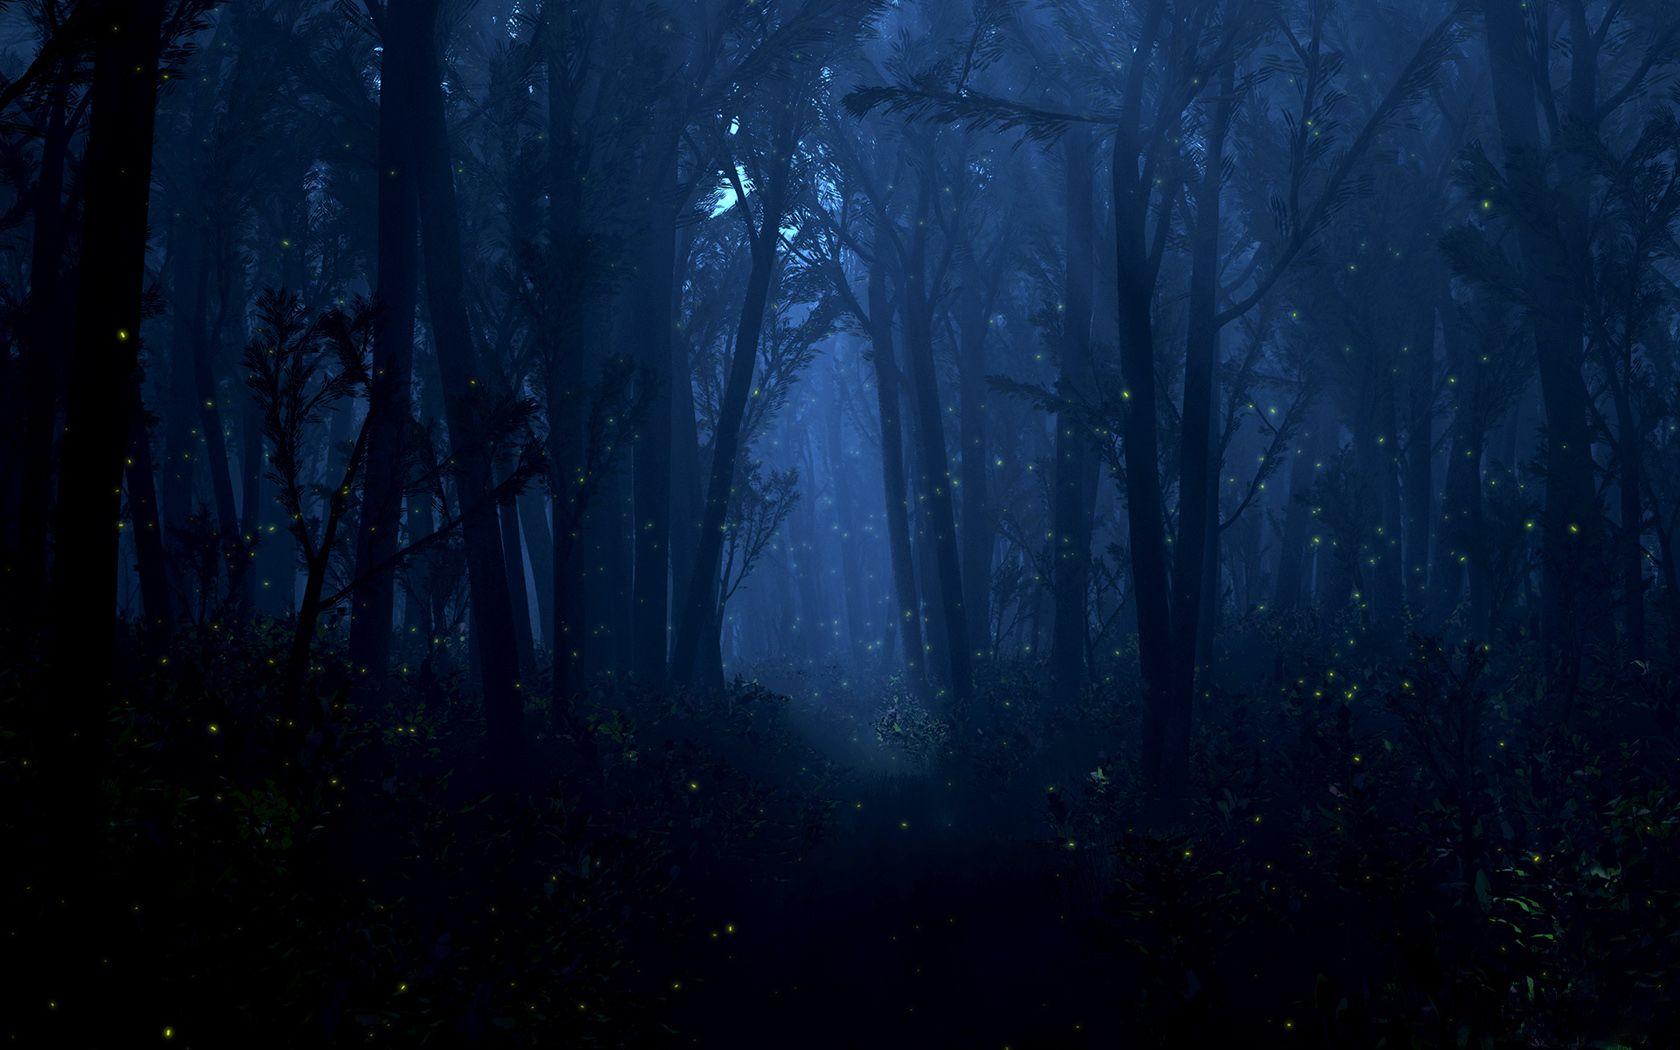 Popular Wallpaper Night Forest - 807a6a0322e391637e4c1cfd5cbfe8b3  Snapshot-17032.jpg